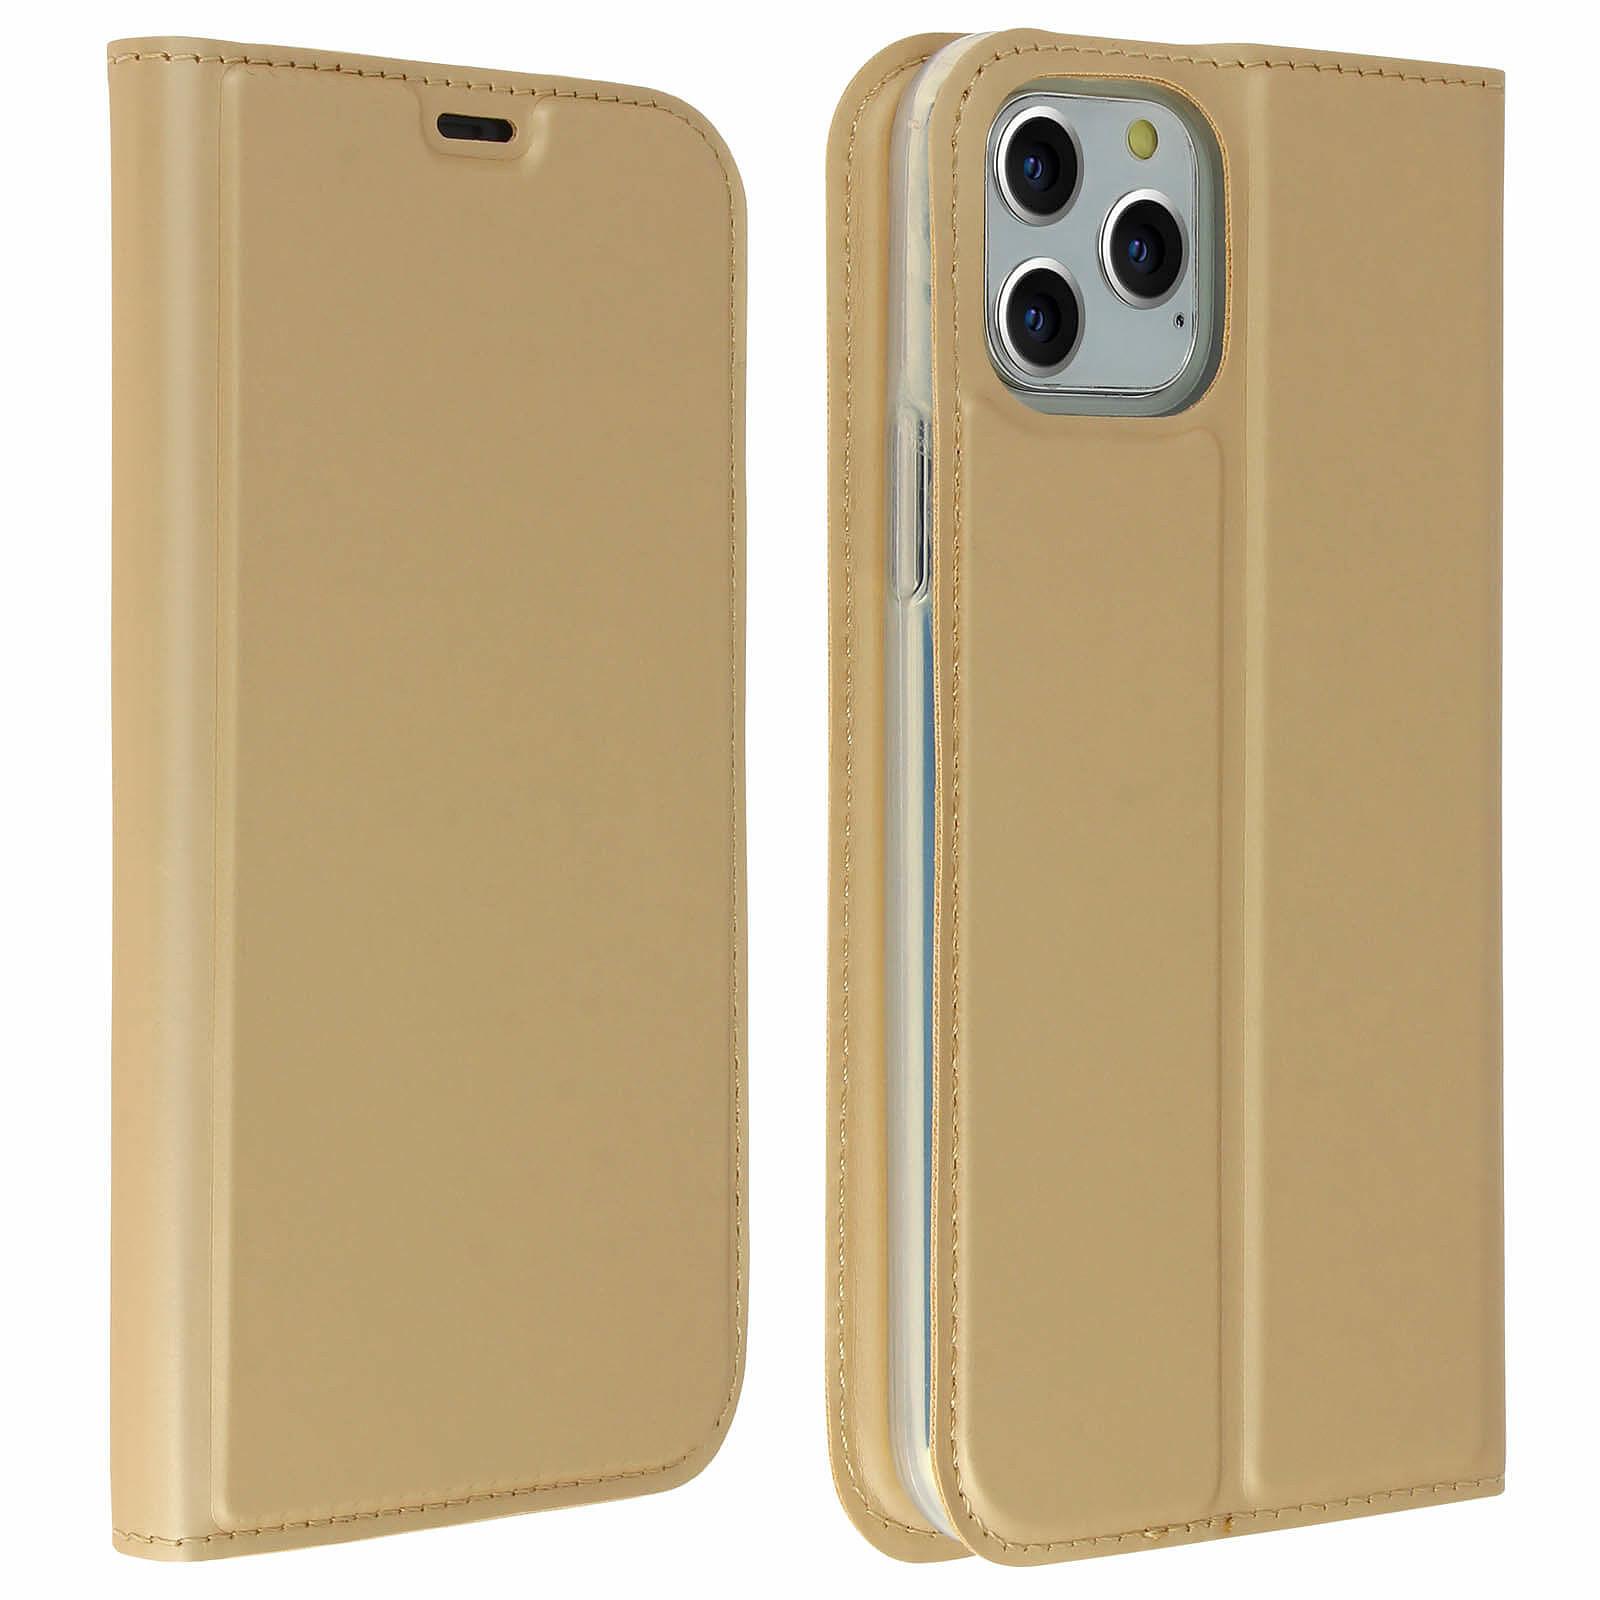 Avizar Etui folio Dorée Éco-cuir pour Apple iPhone 11 Pro Max